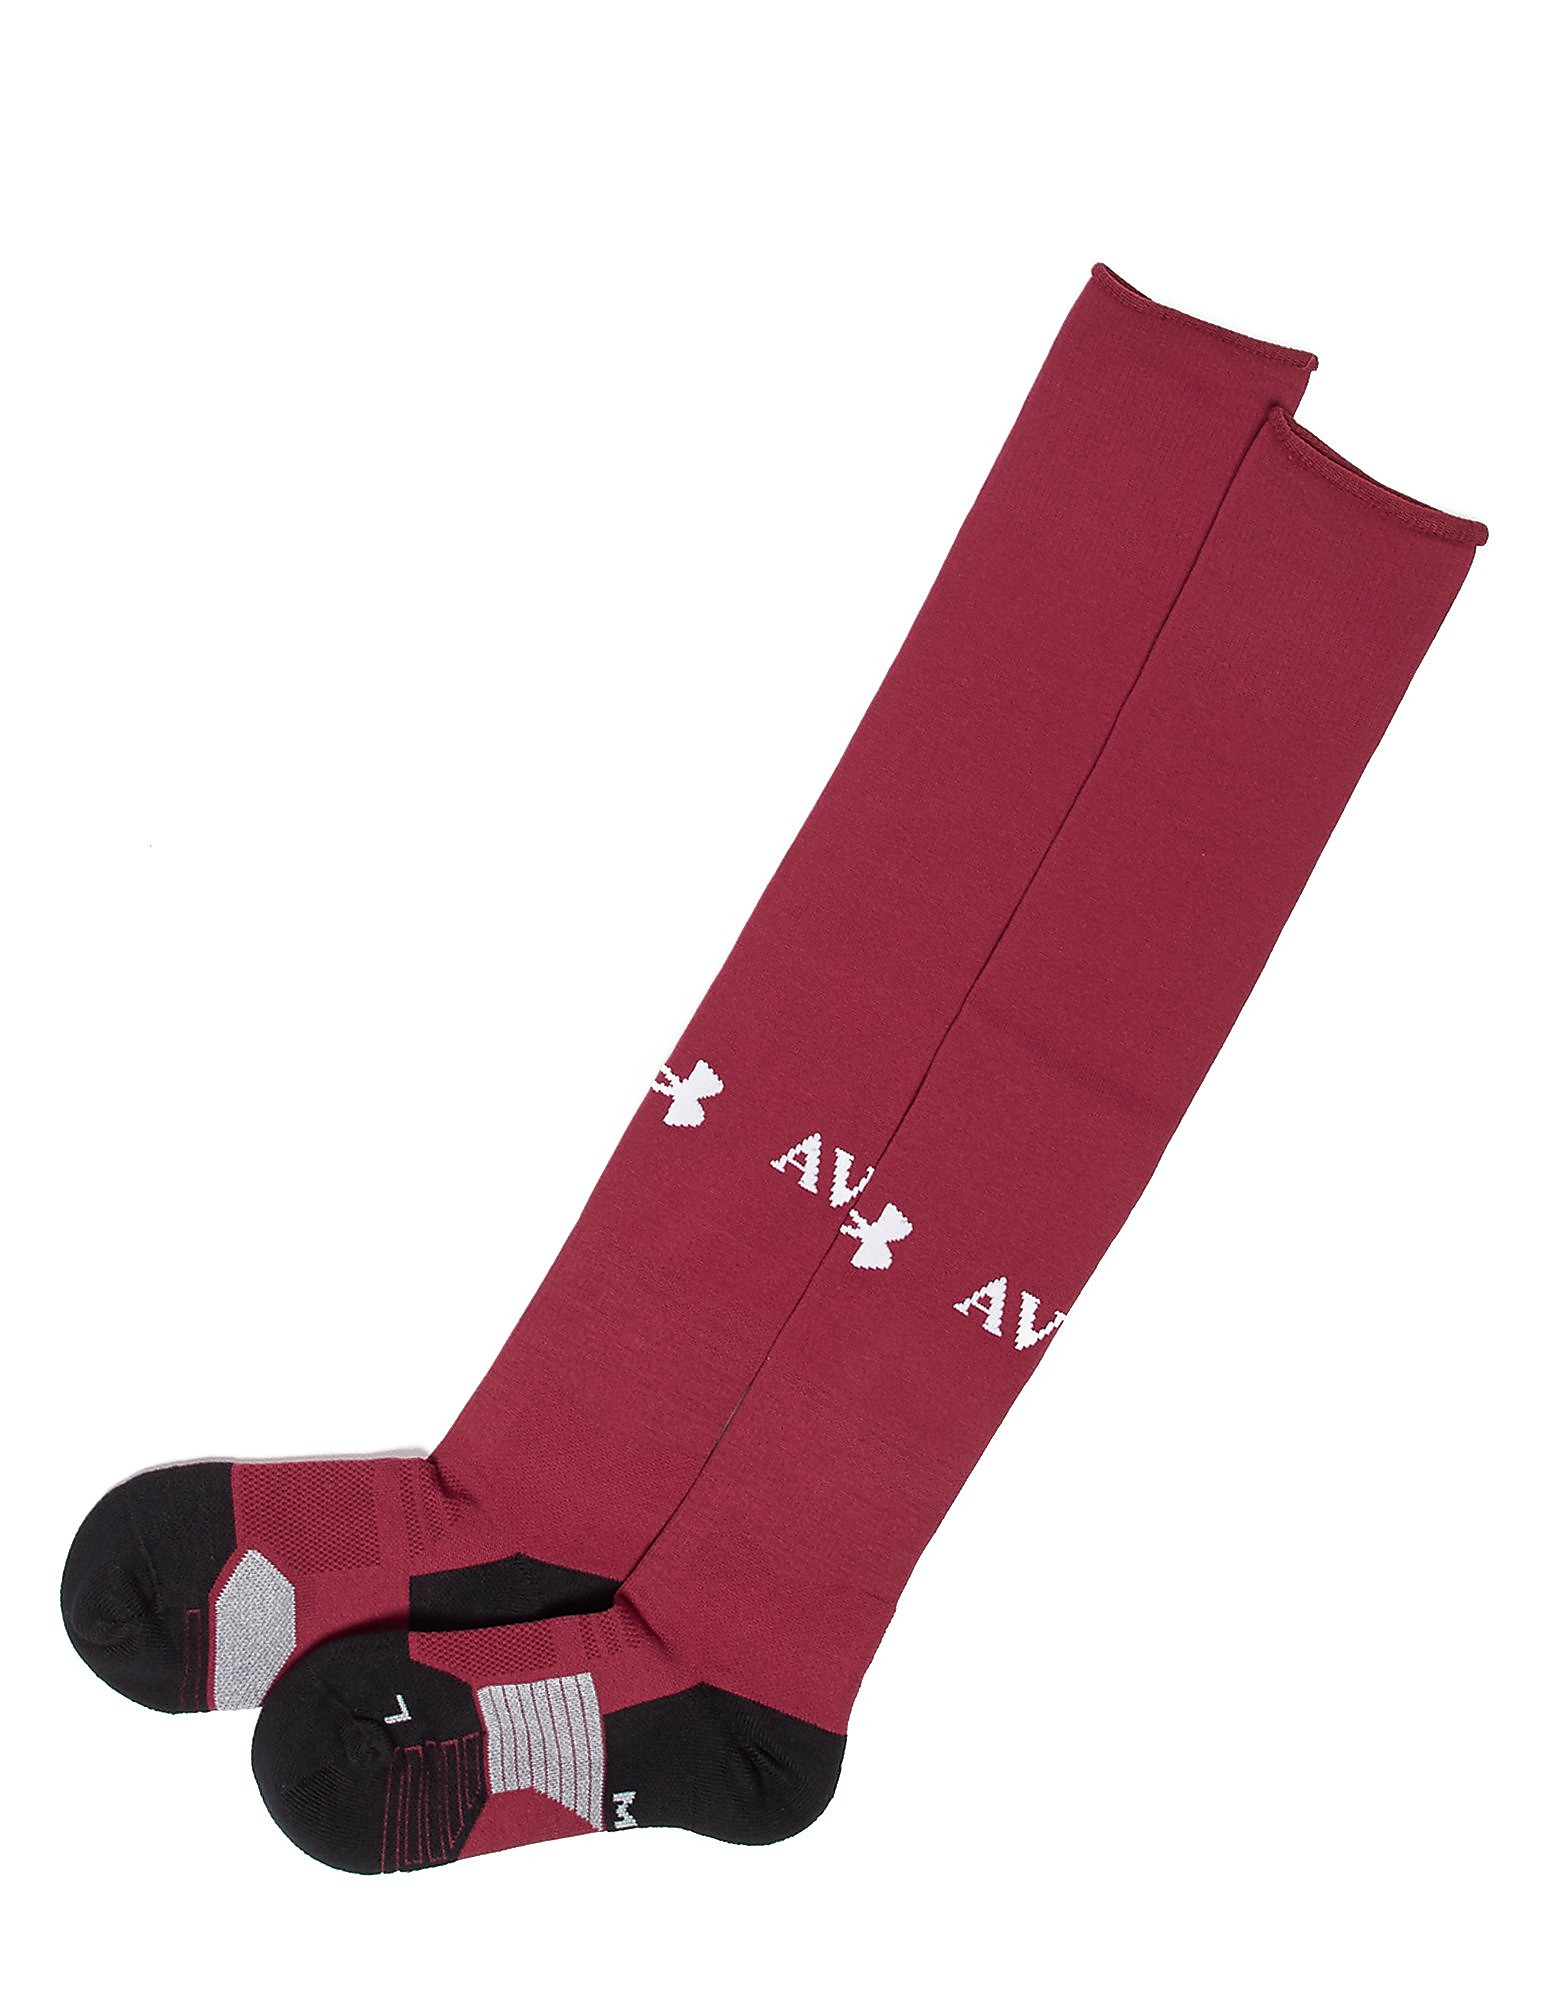 Under Armour Aston Villa 2017/18 Home Socks